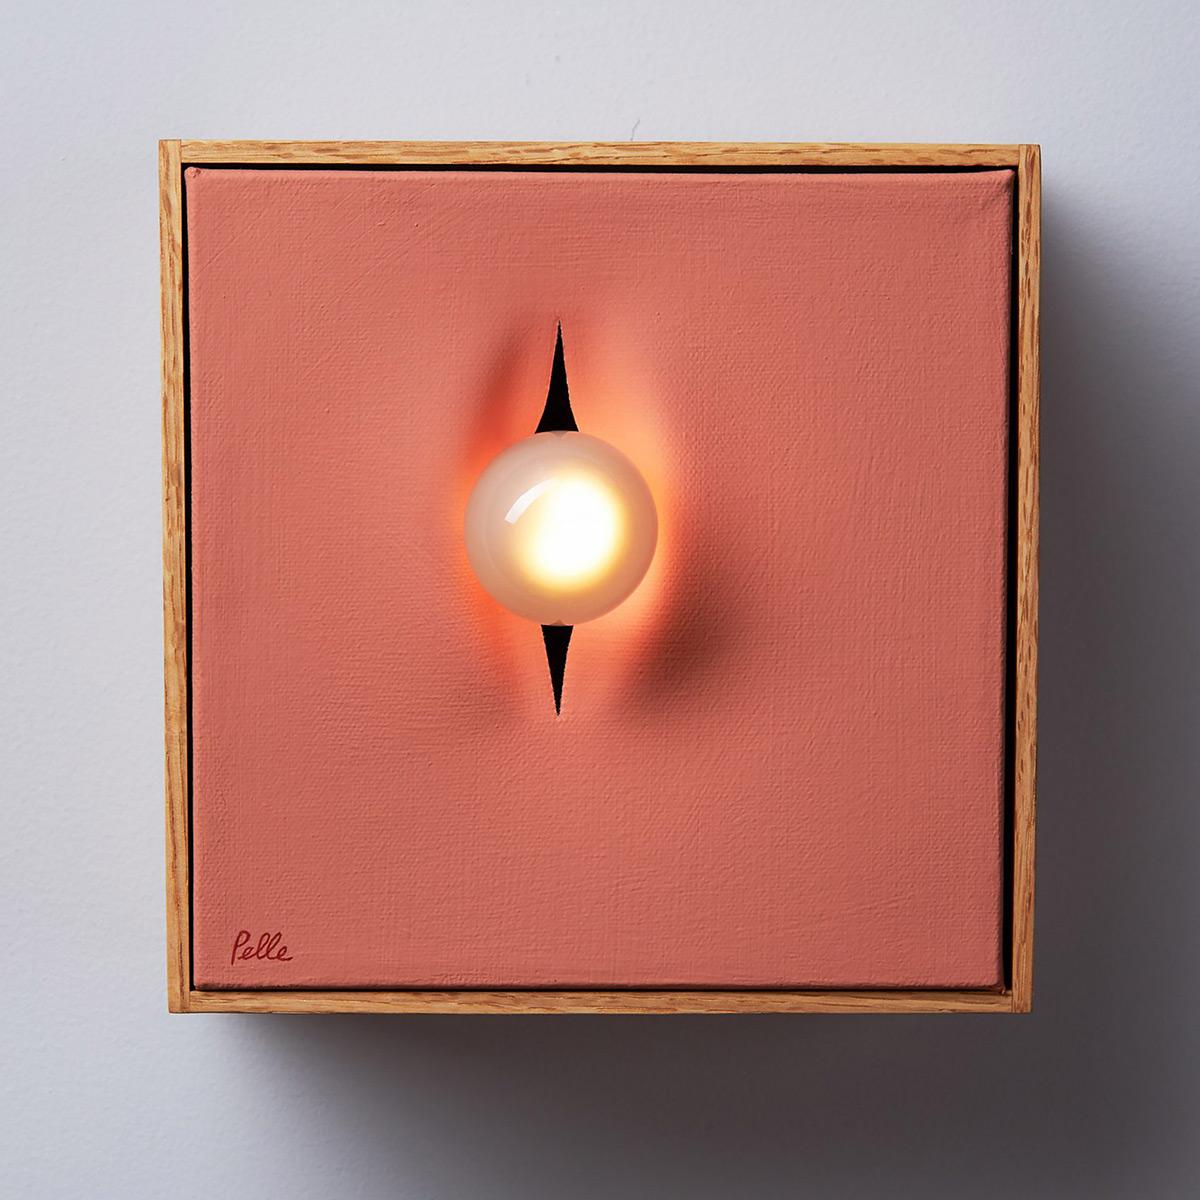 Incise-Paintings-Pelle-Design-Daniel-Seung-Lee-02